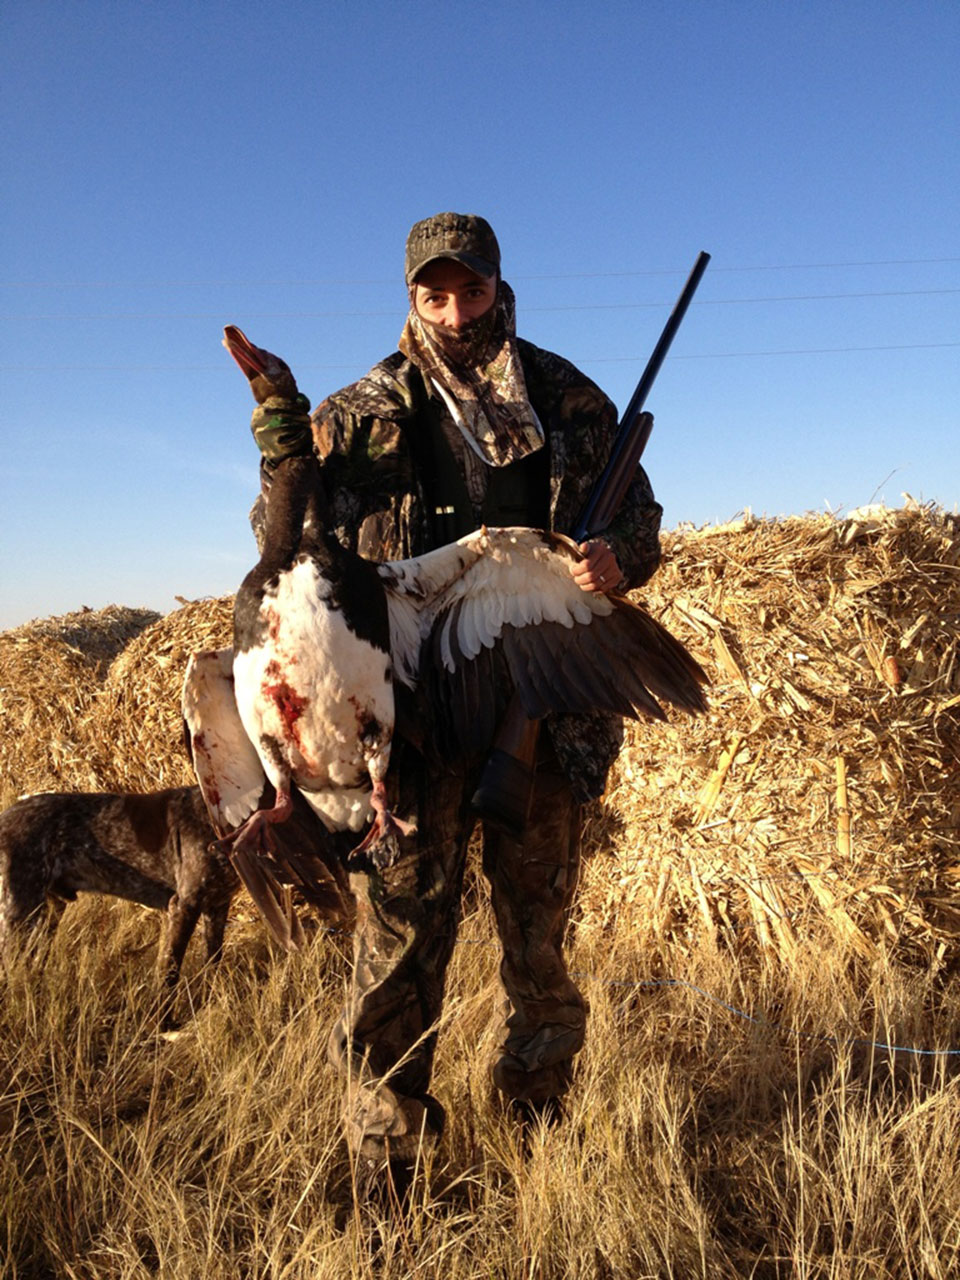 Spur-Winged-Goose-Hunting-Safaris-South-Africa.jpg